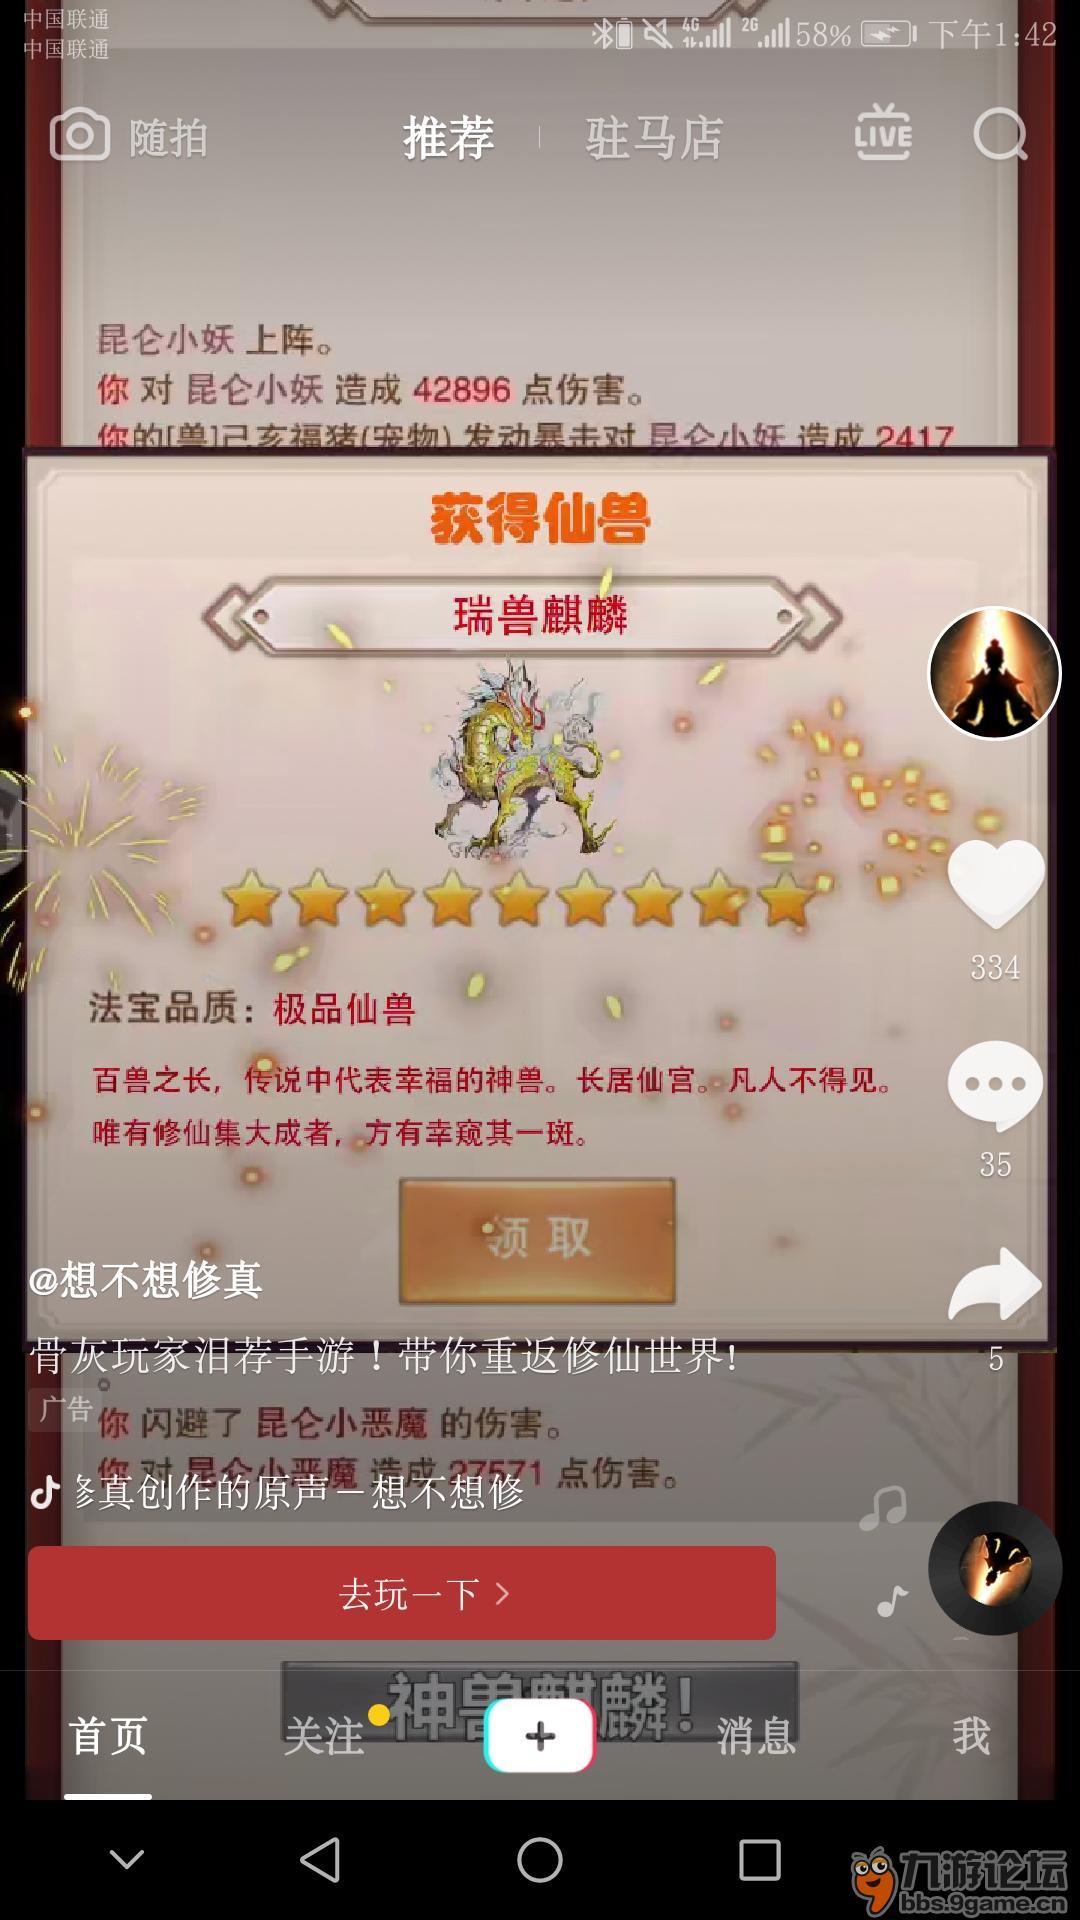 changpianxiangcunluanlunxiaoshuo_关于鬼佬最近又给自己画了没有luan用的饼